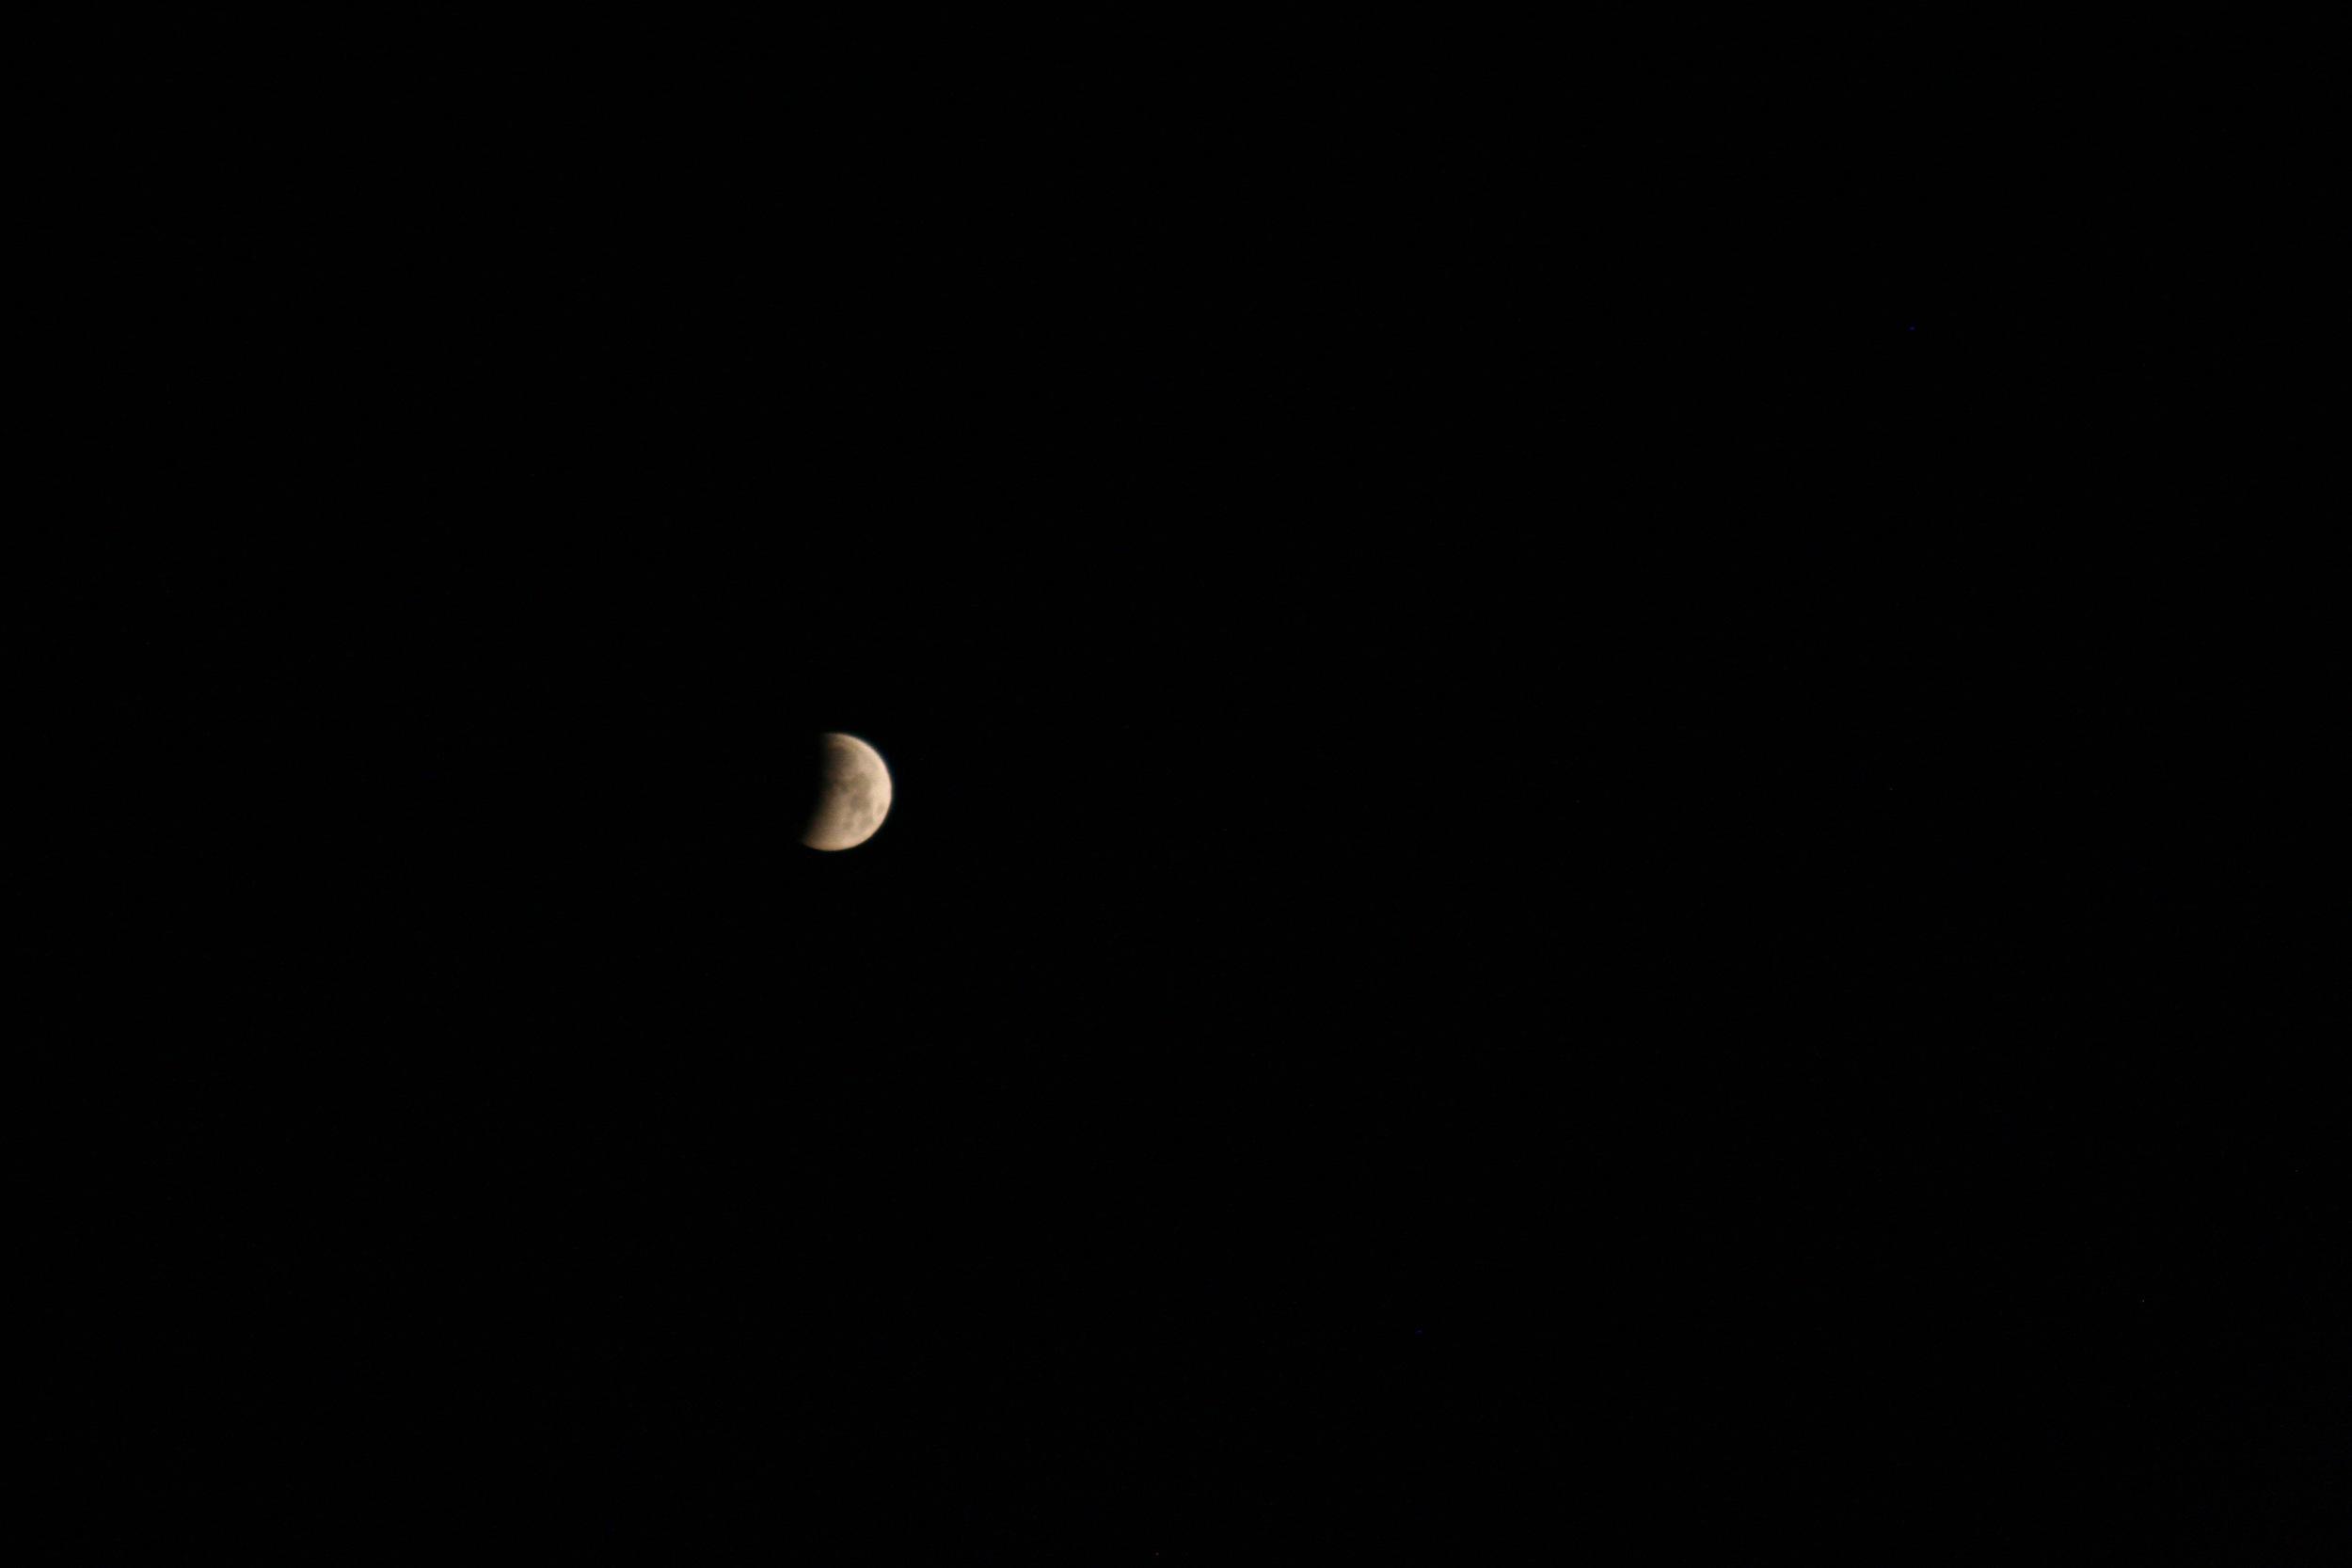 Lunar Eclipse April 20154.jpg